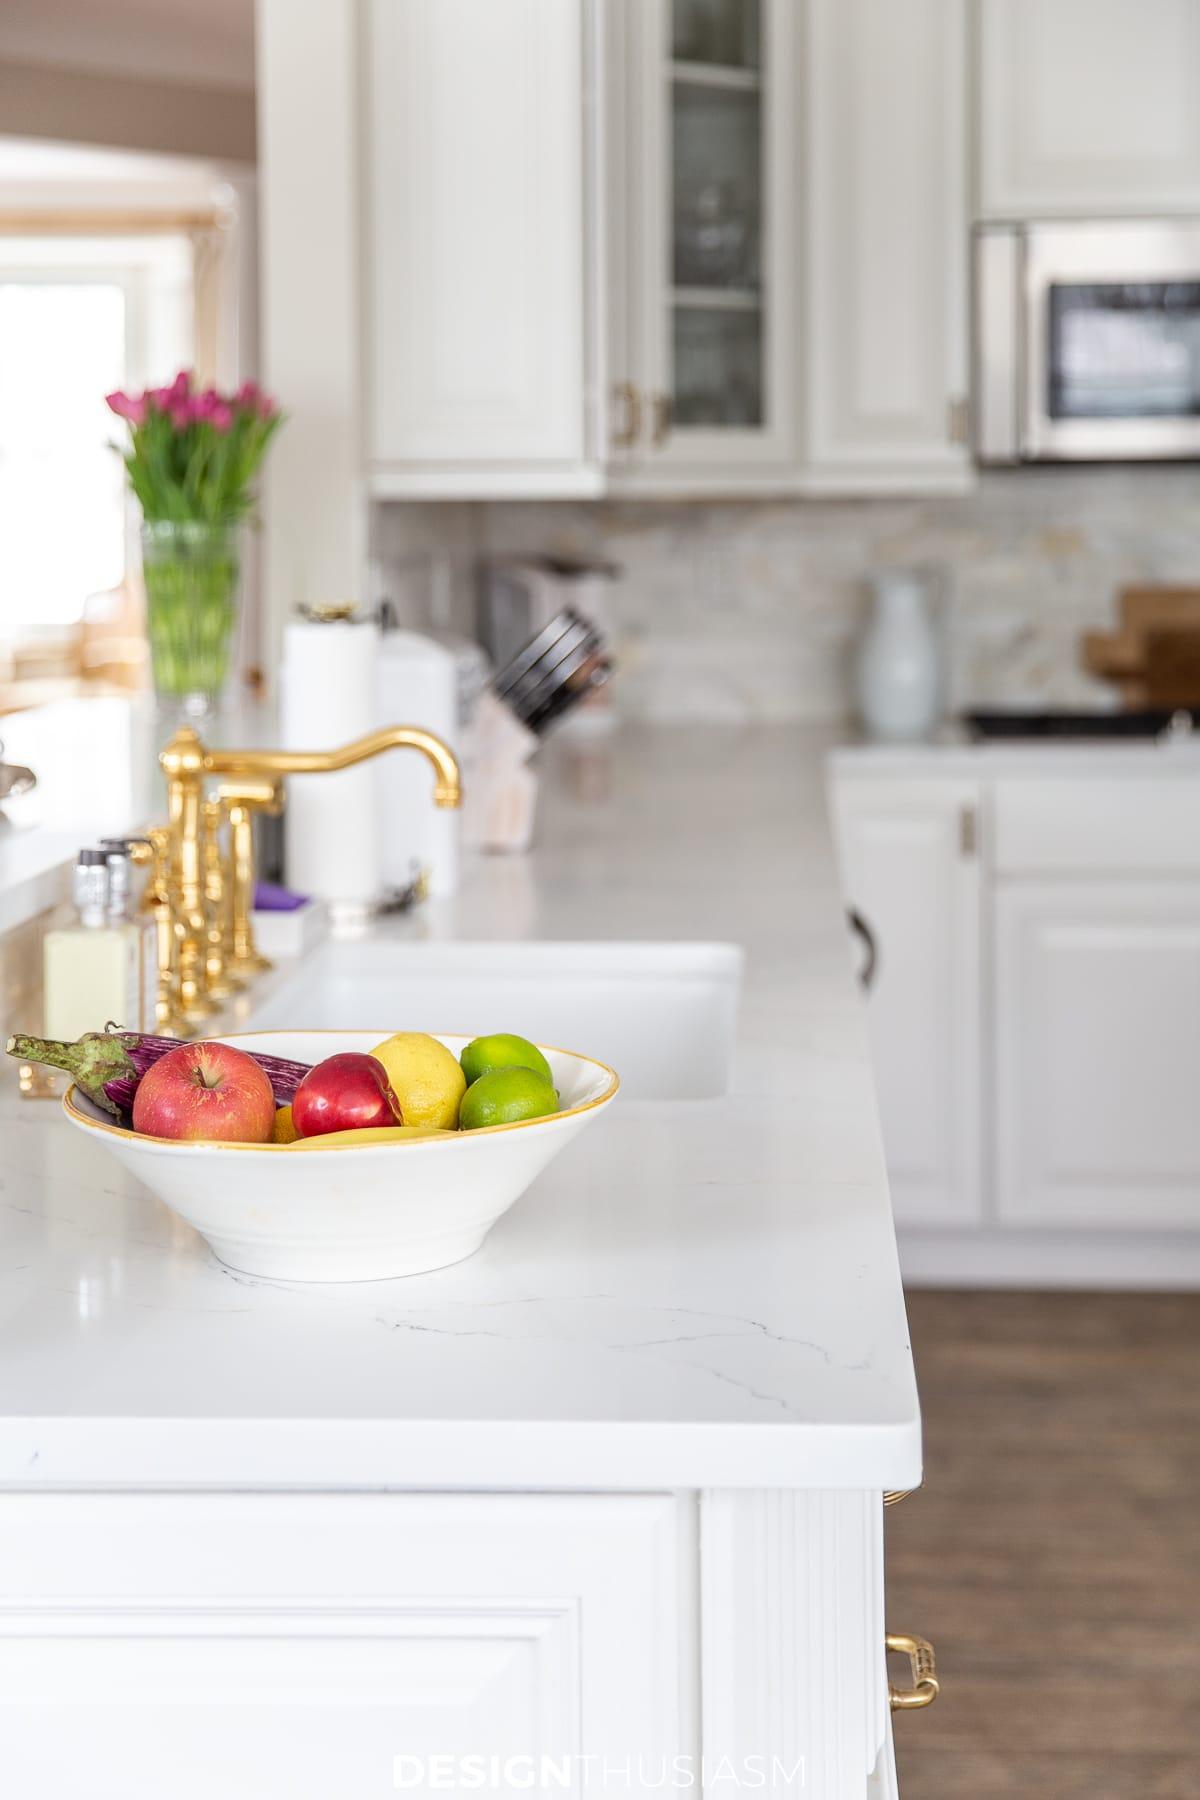 kitchen remodel with white quartz countertops